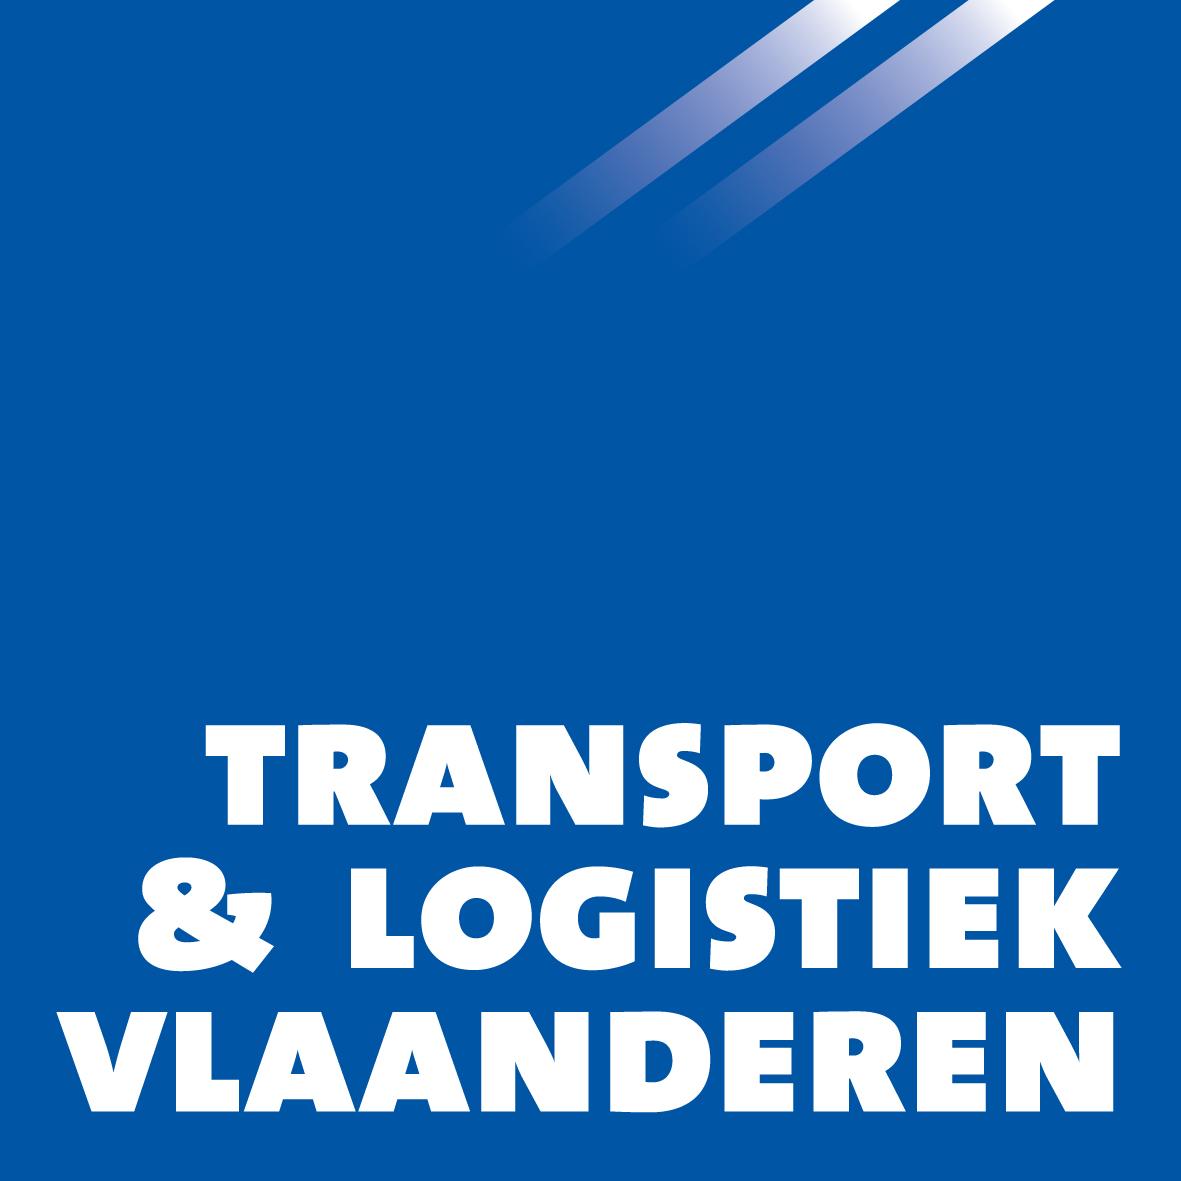 Transportbedrijf Desimpel trans logo transport en logistiek Vlaanderen